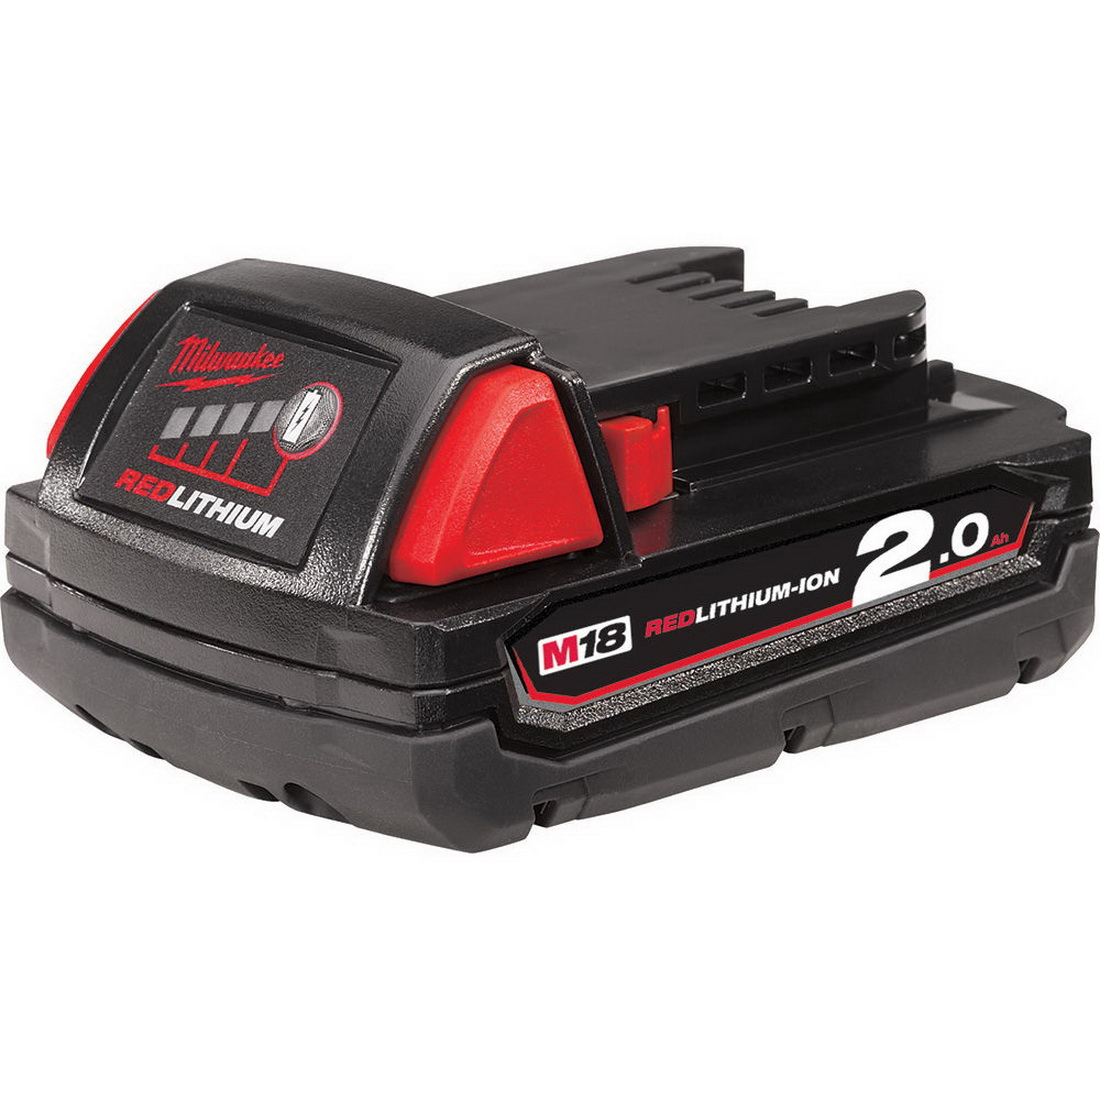 M18 REDLITHIUM High Demand Compact Battery 2.0Ah